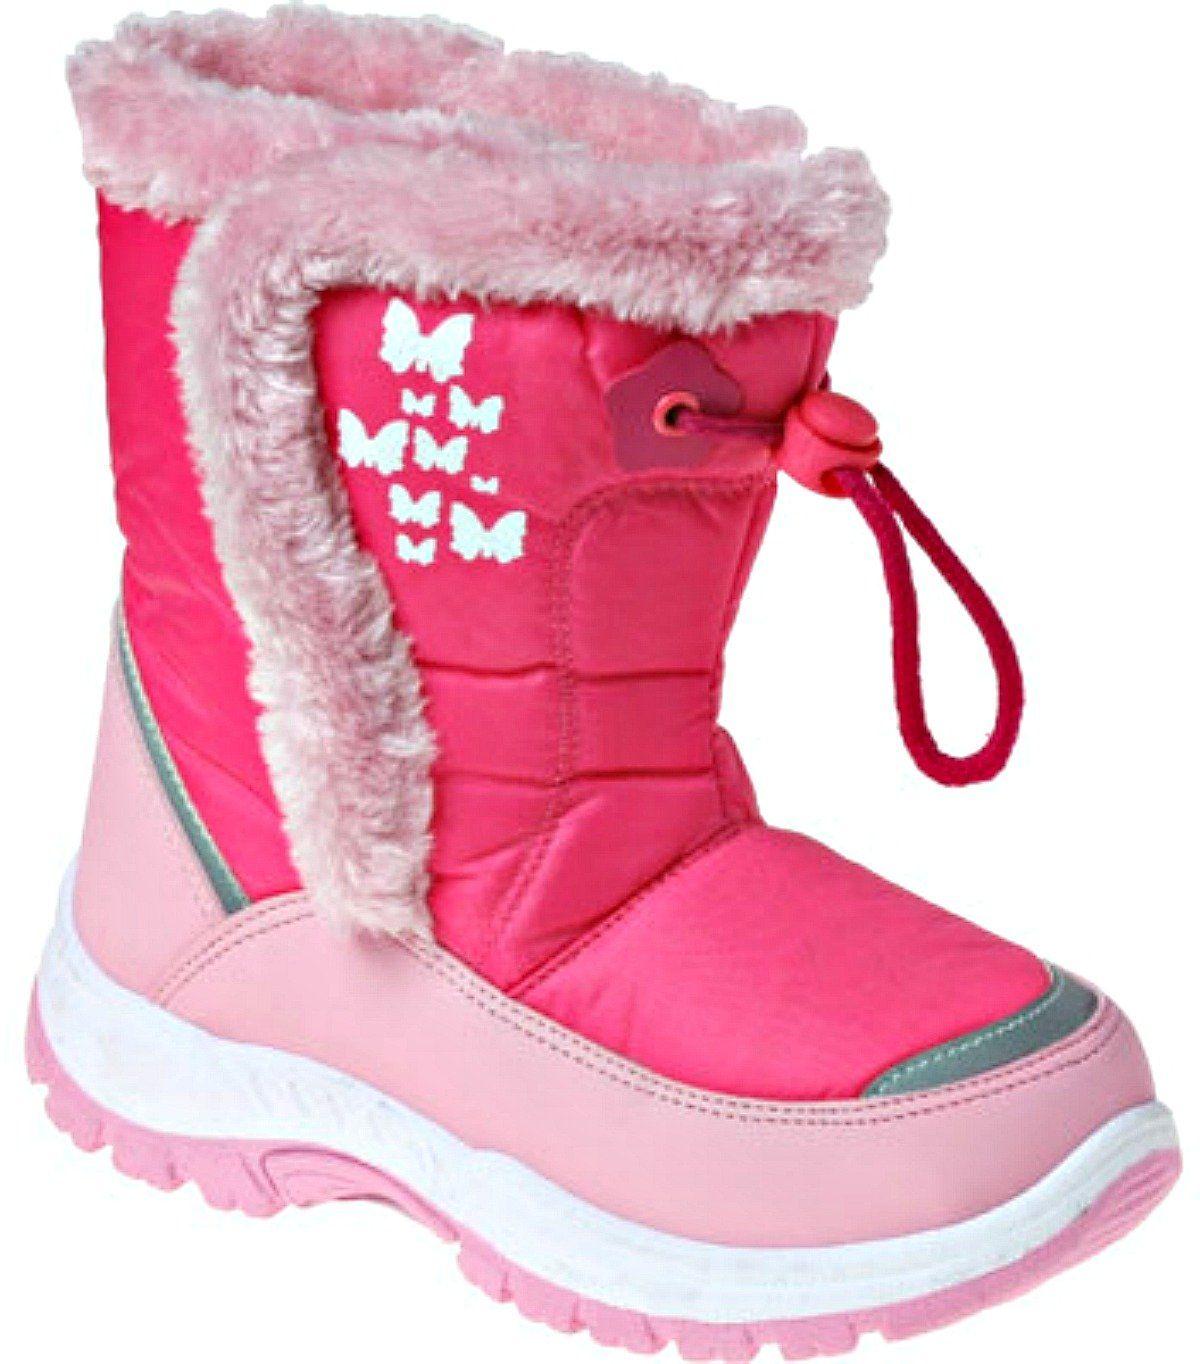 Black 10 M US Toddler Rugged Bear Girls Snowflake Print Snow Boots Kids